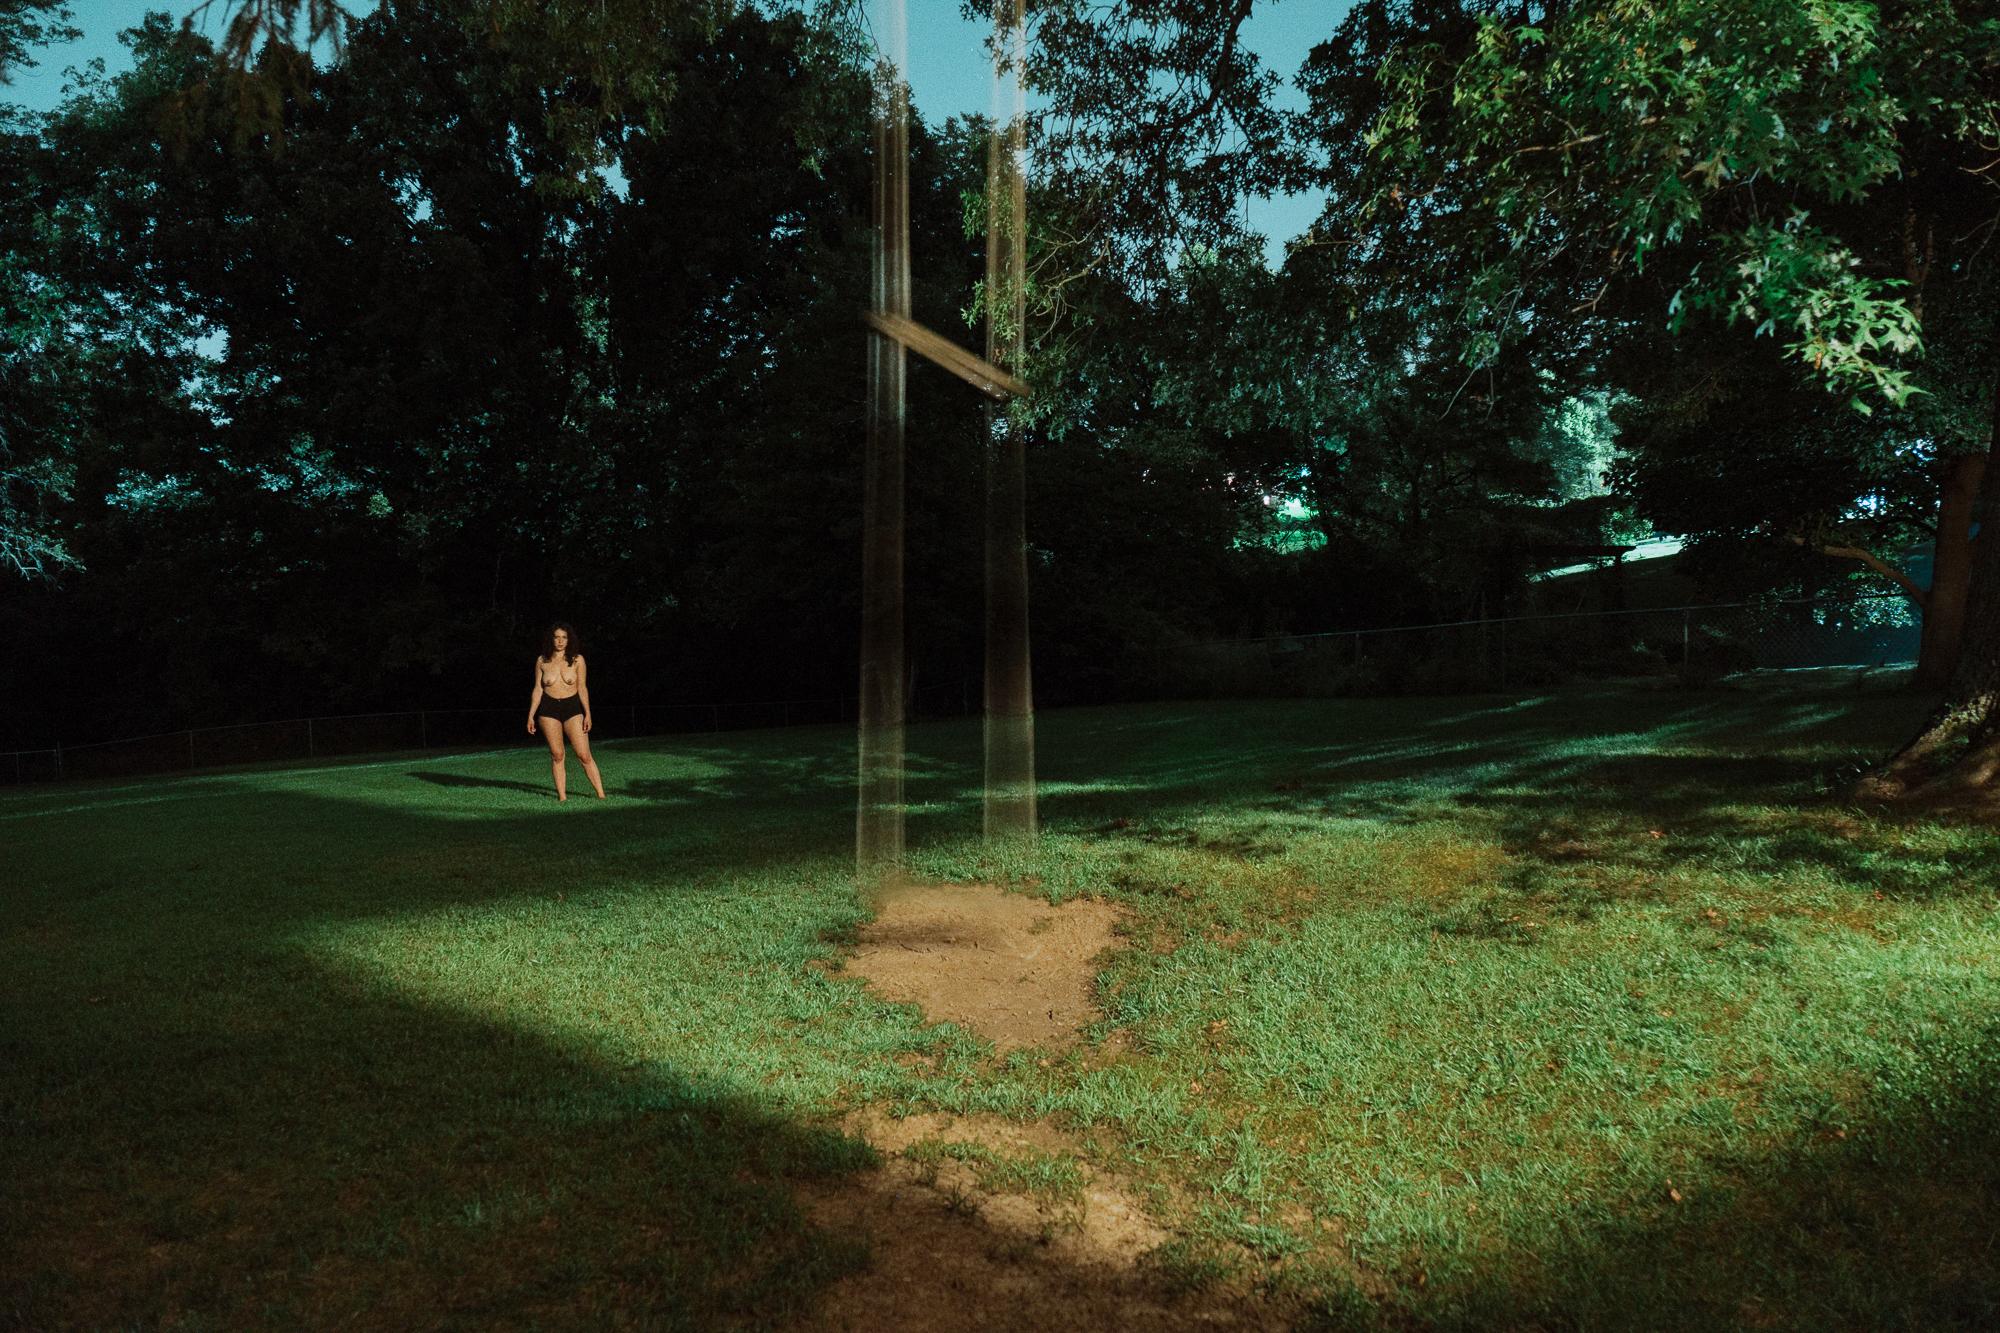 20180813-Hannah-night-outside-X-T2-0016-Edit.jpg